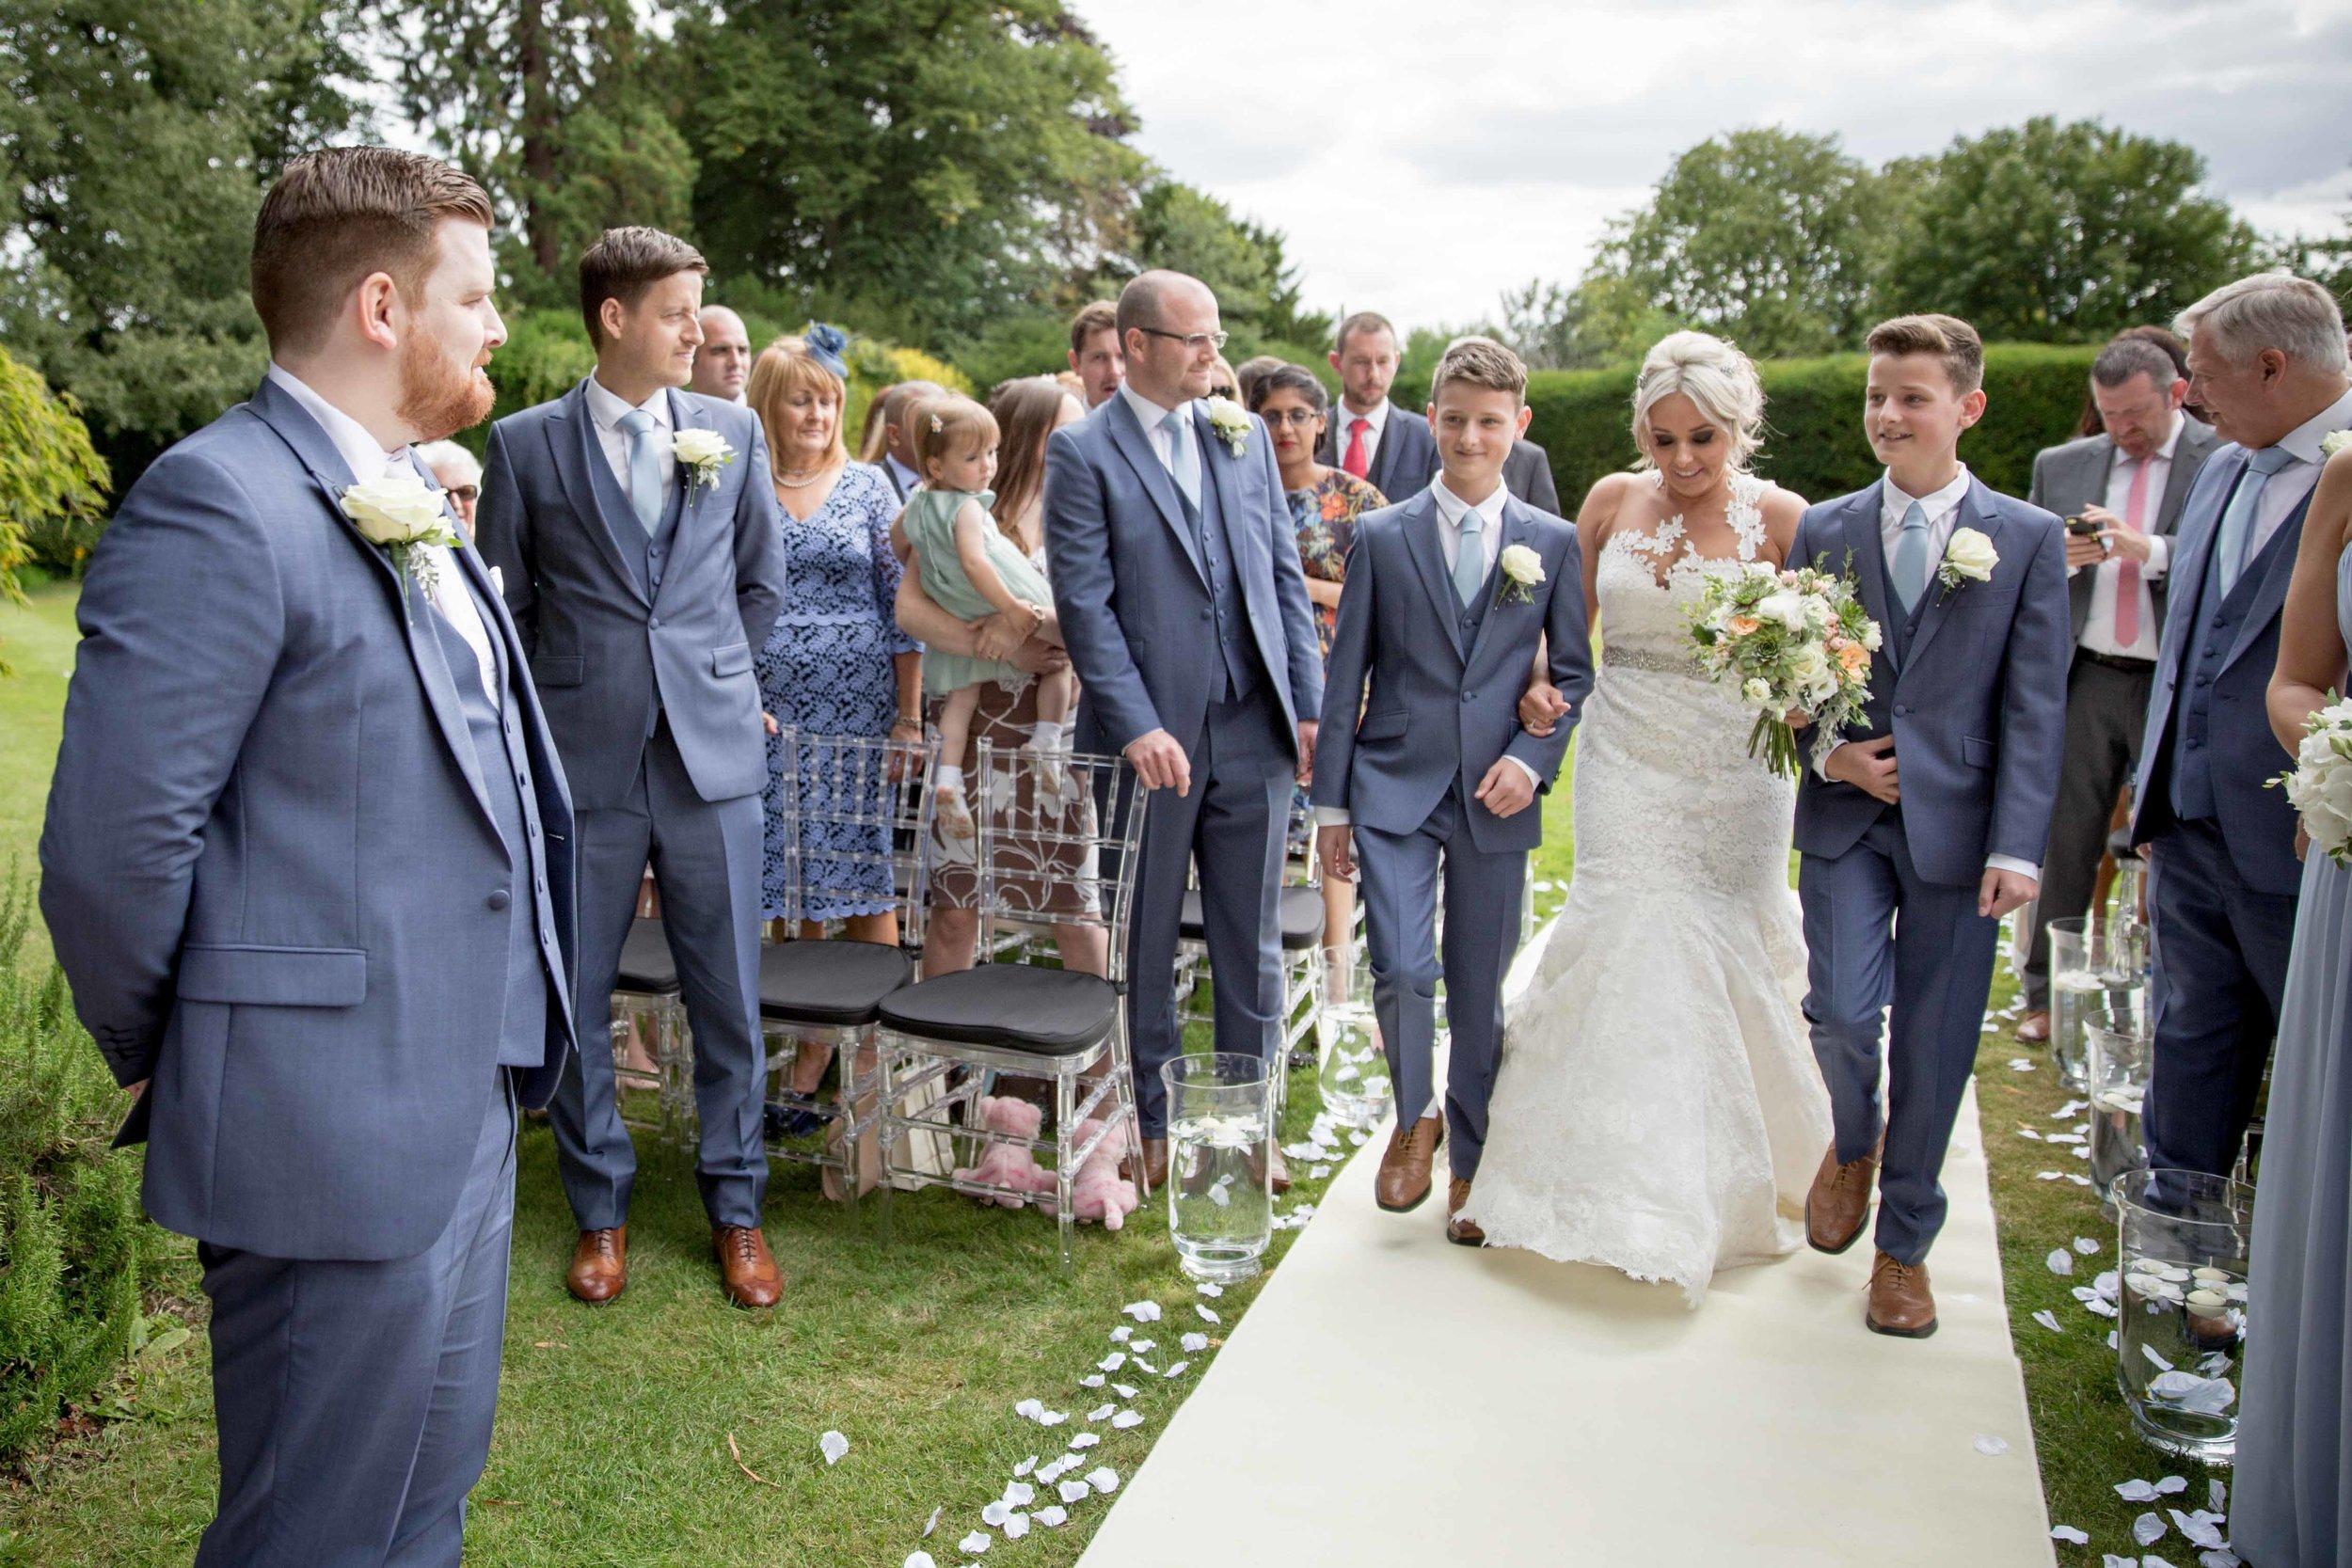 cotswold-wedding-photography-at-stonehouse-court-hotel-natalia-smith-photography-gloucestershire-wedding-photographer-15.jpg